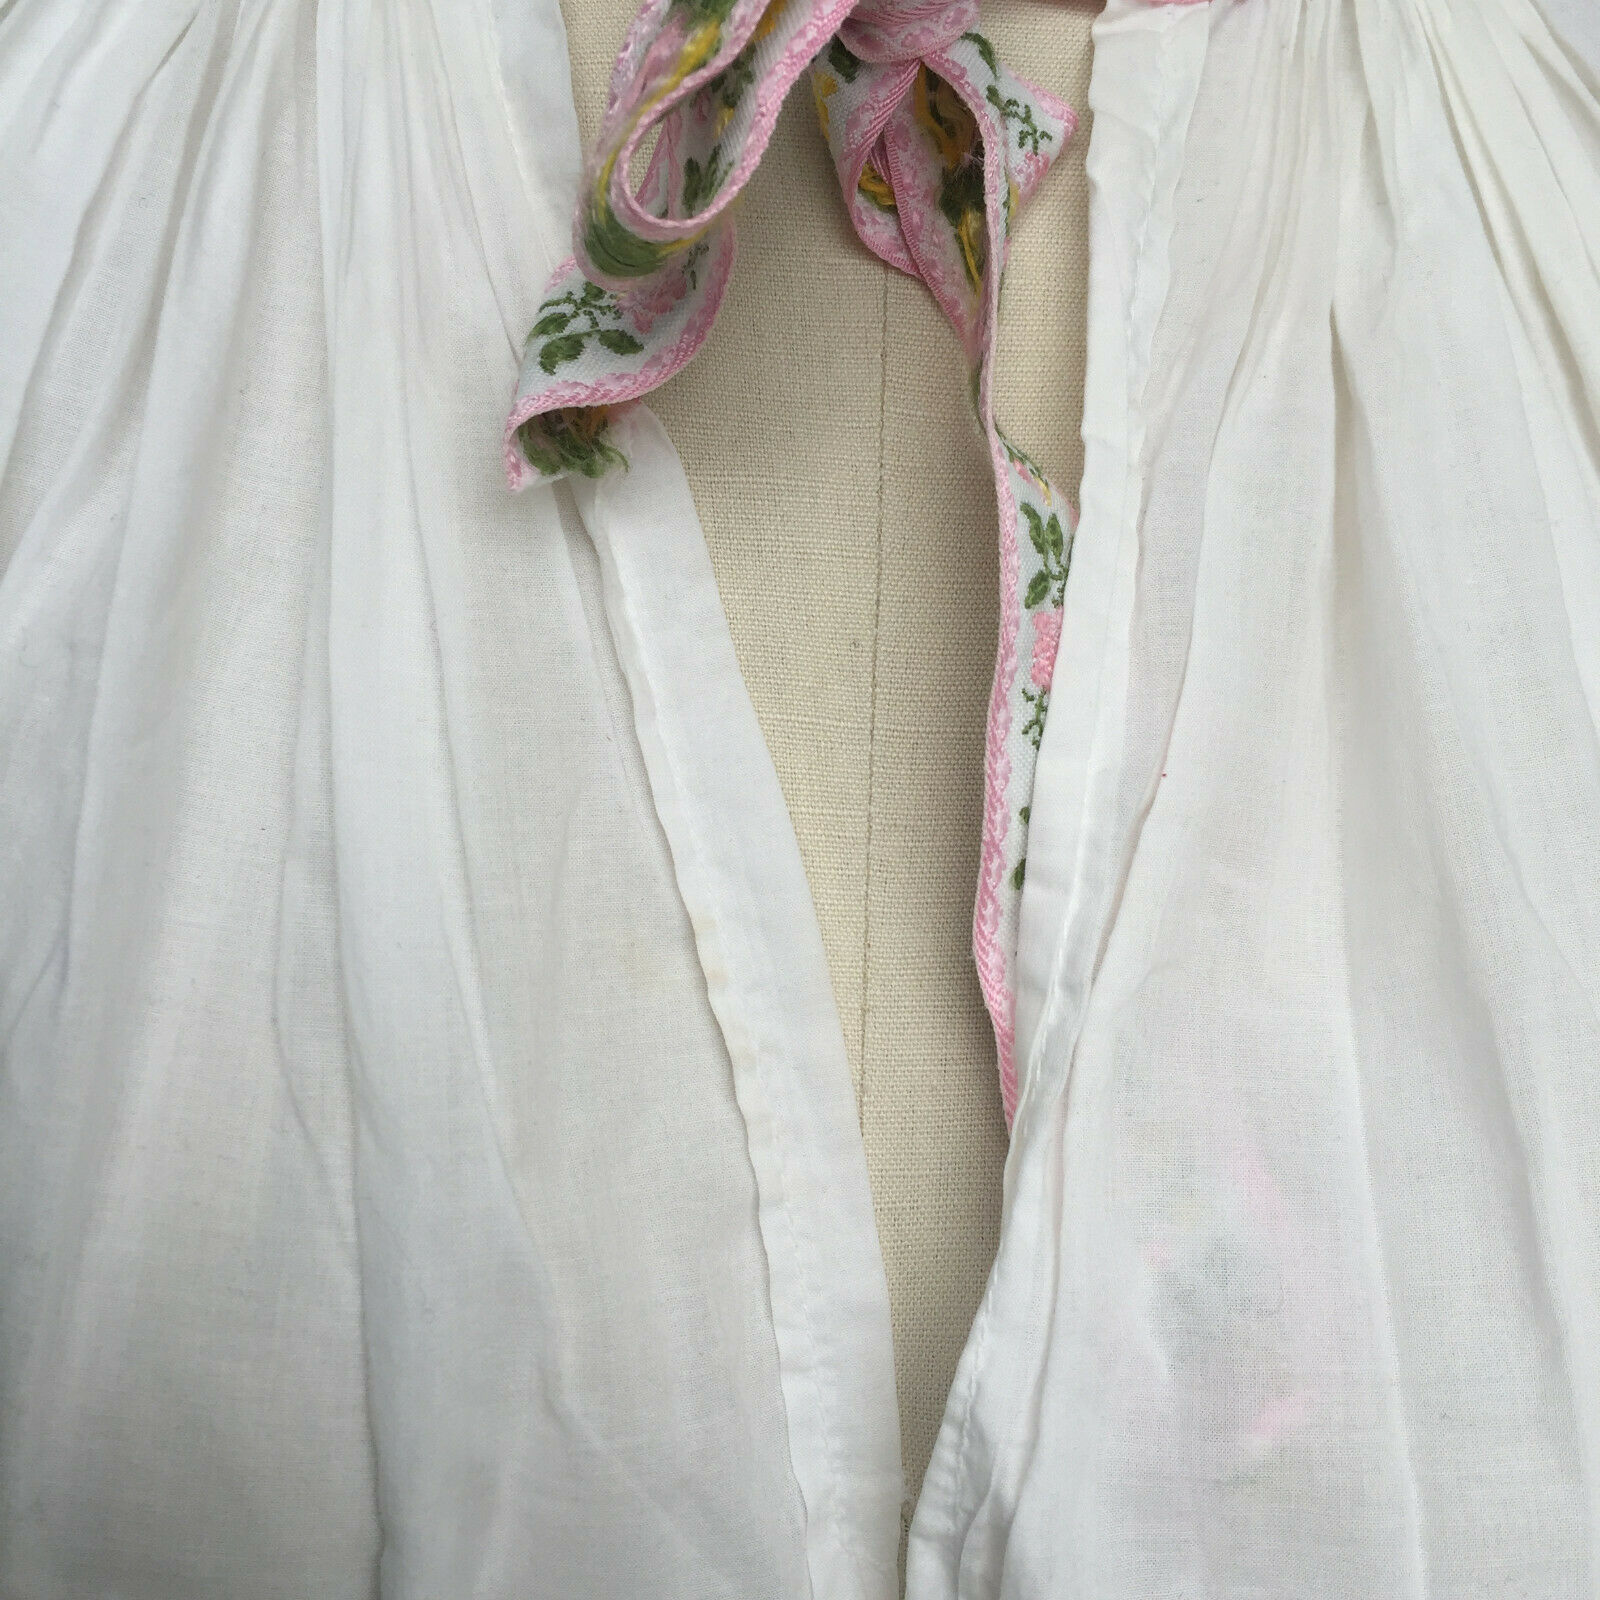 VTG 1970s Hungarian Handmade Textured Boho-Chic P… - image 11